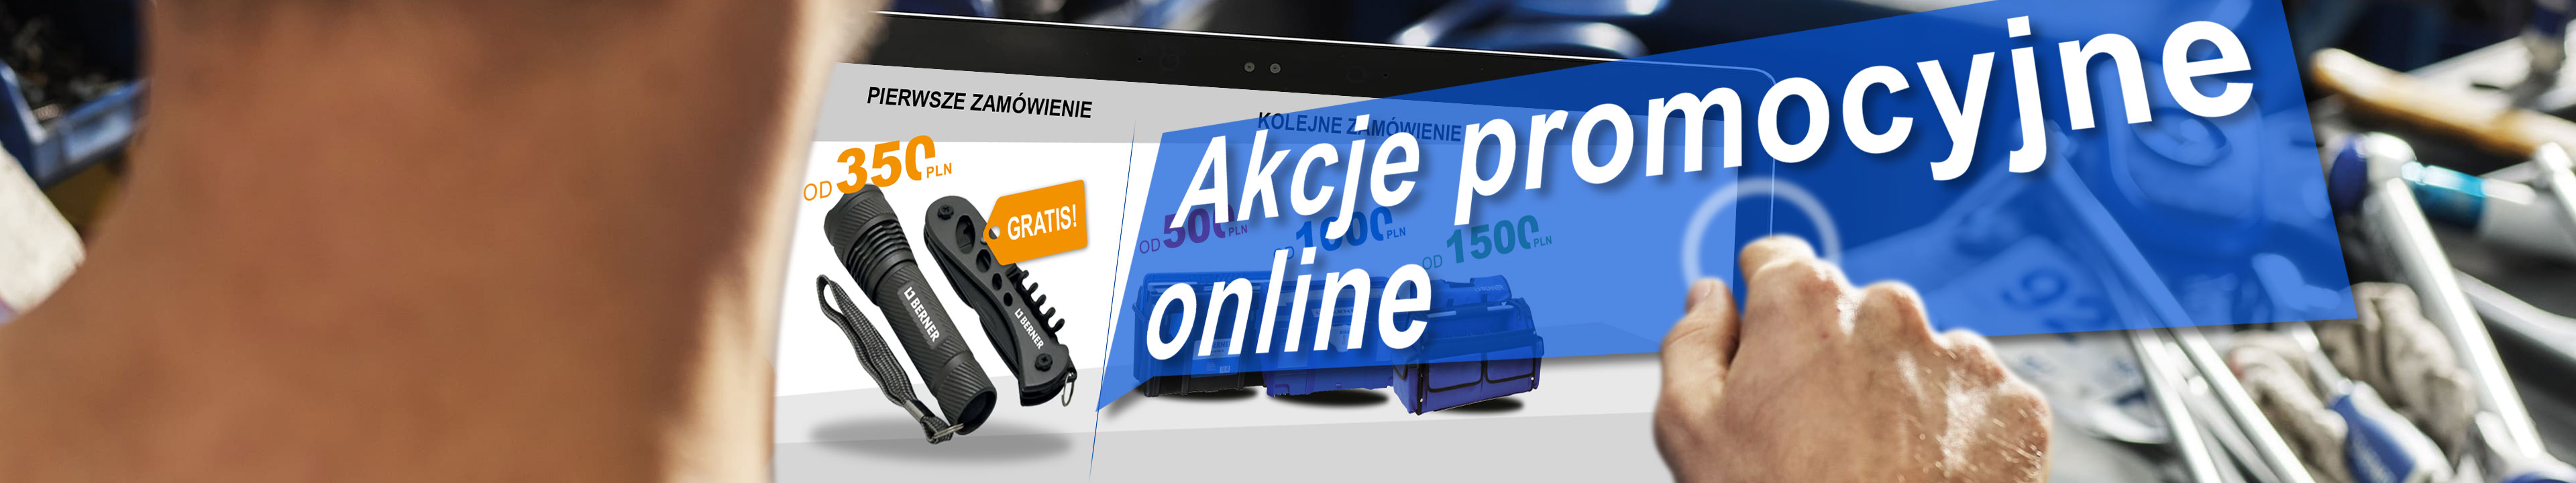 Akcje promocyjne online